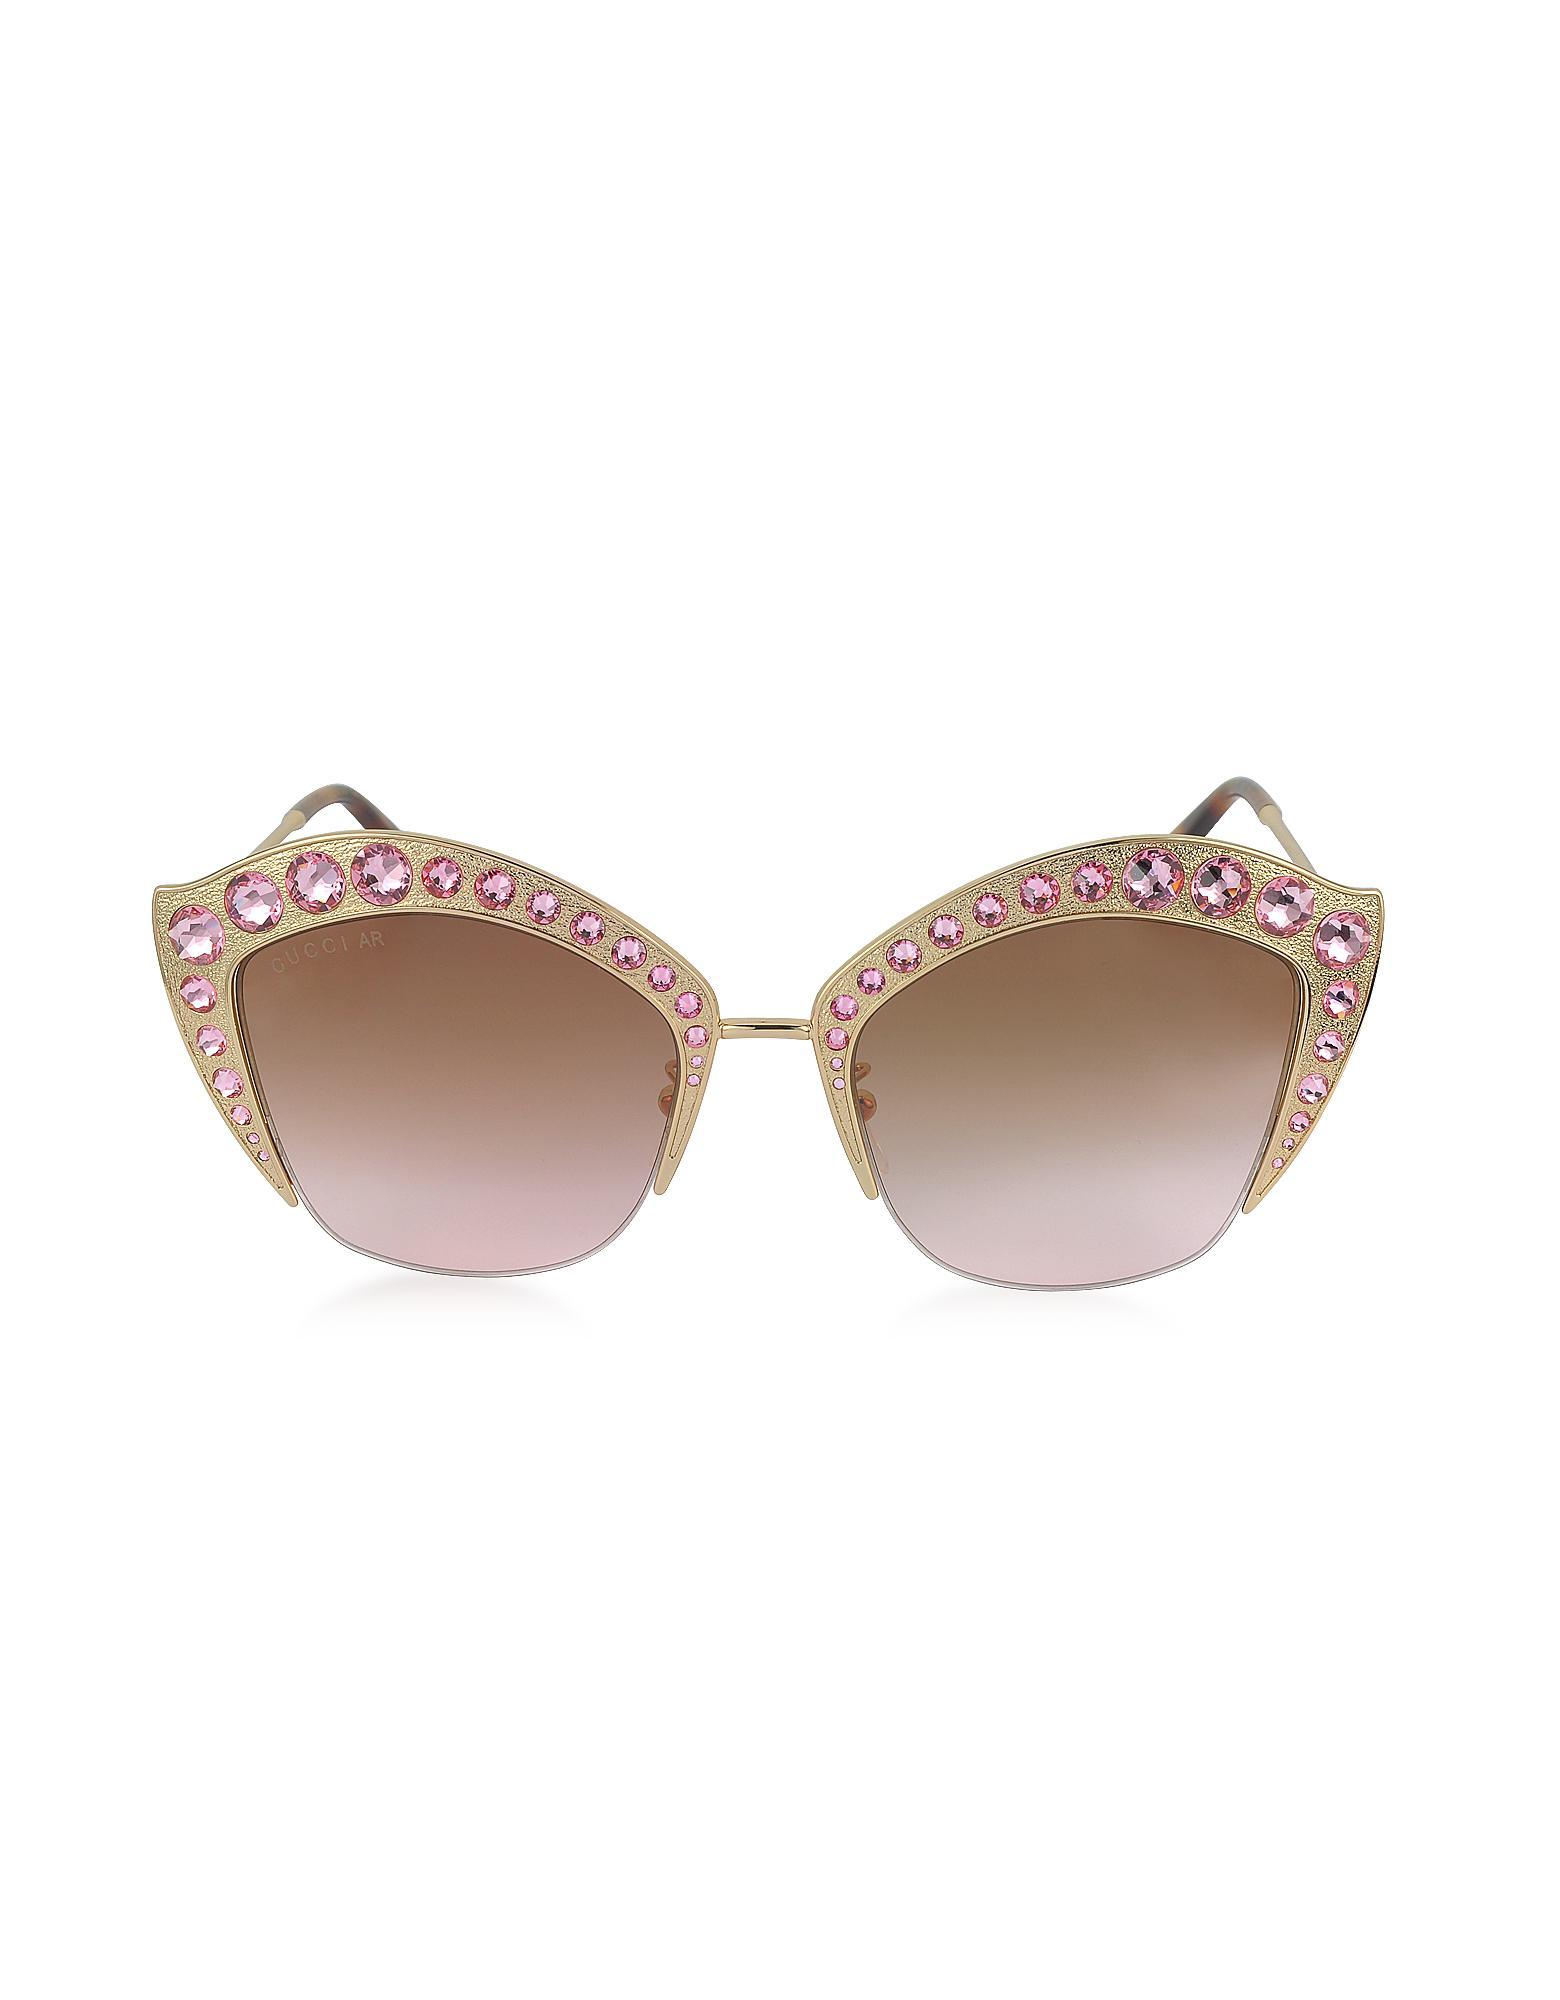 93cb97d9f429 Lyst - Gucci GG0114S Metal Cat Eye Women s Sunglasses W crystals in ...